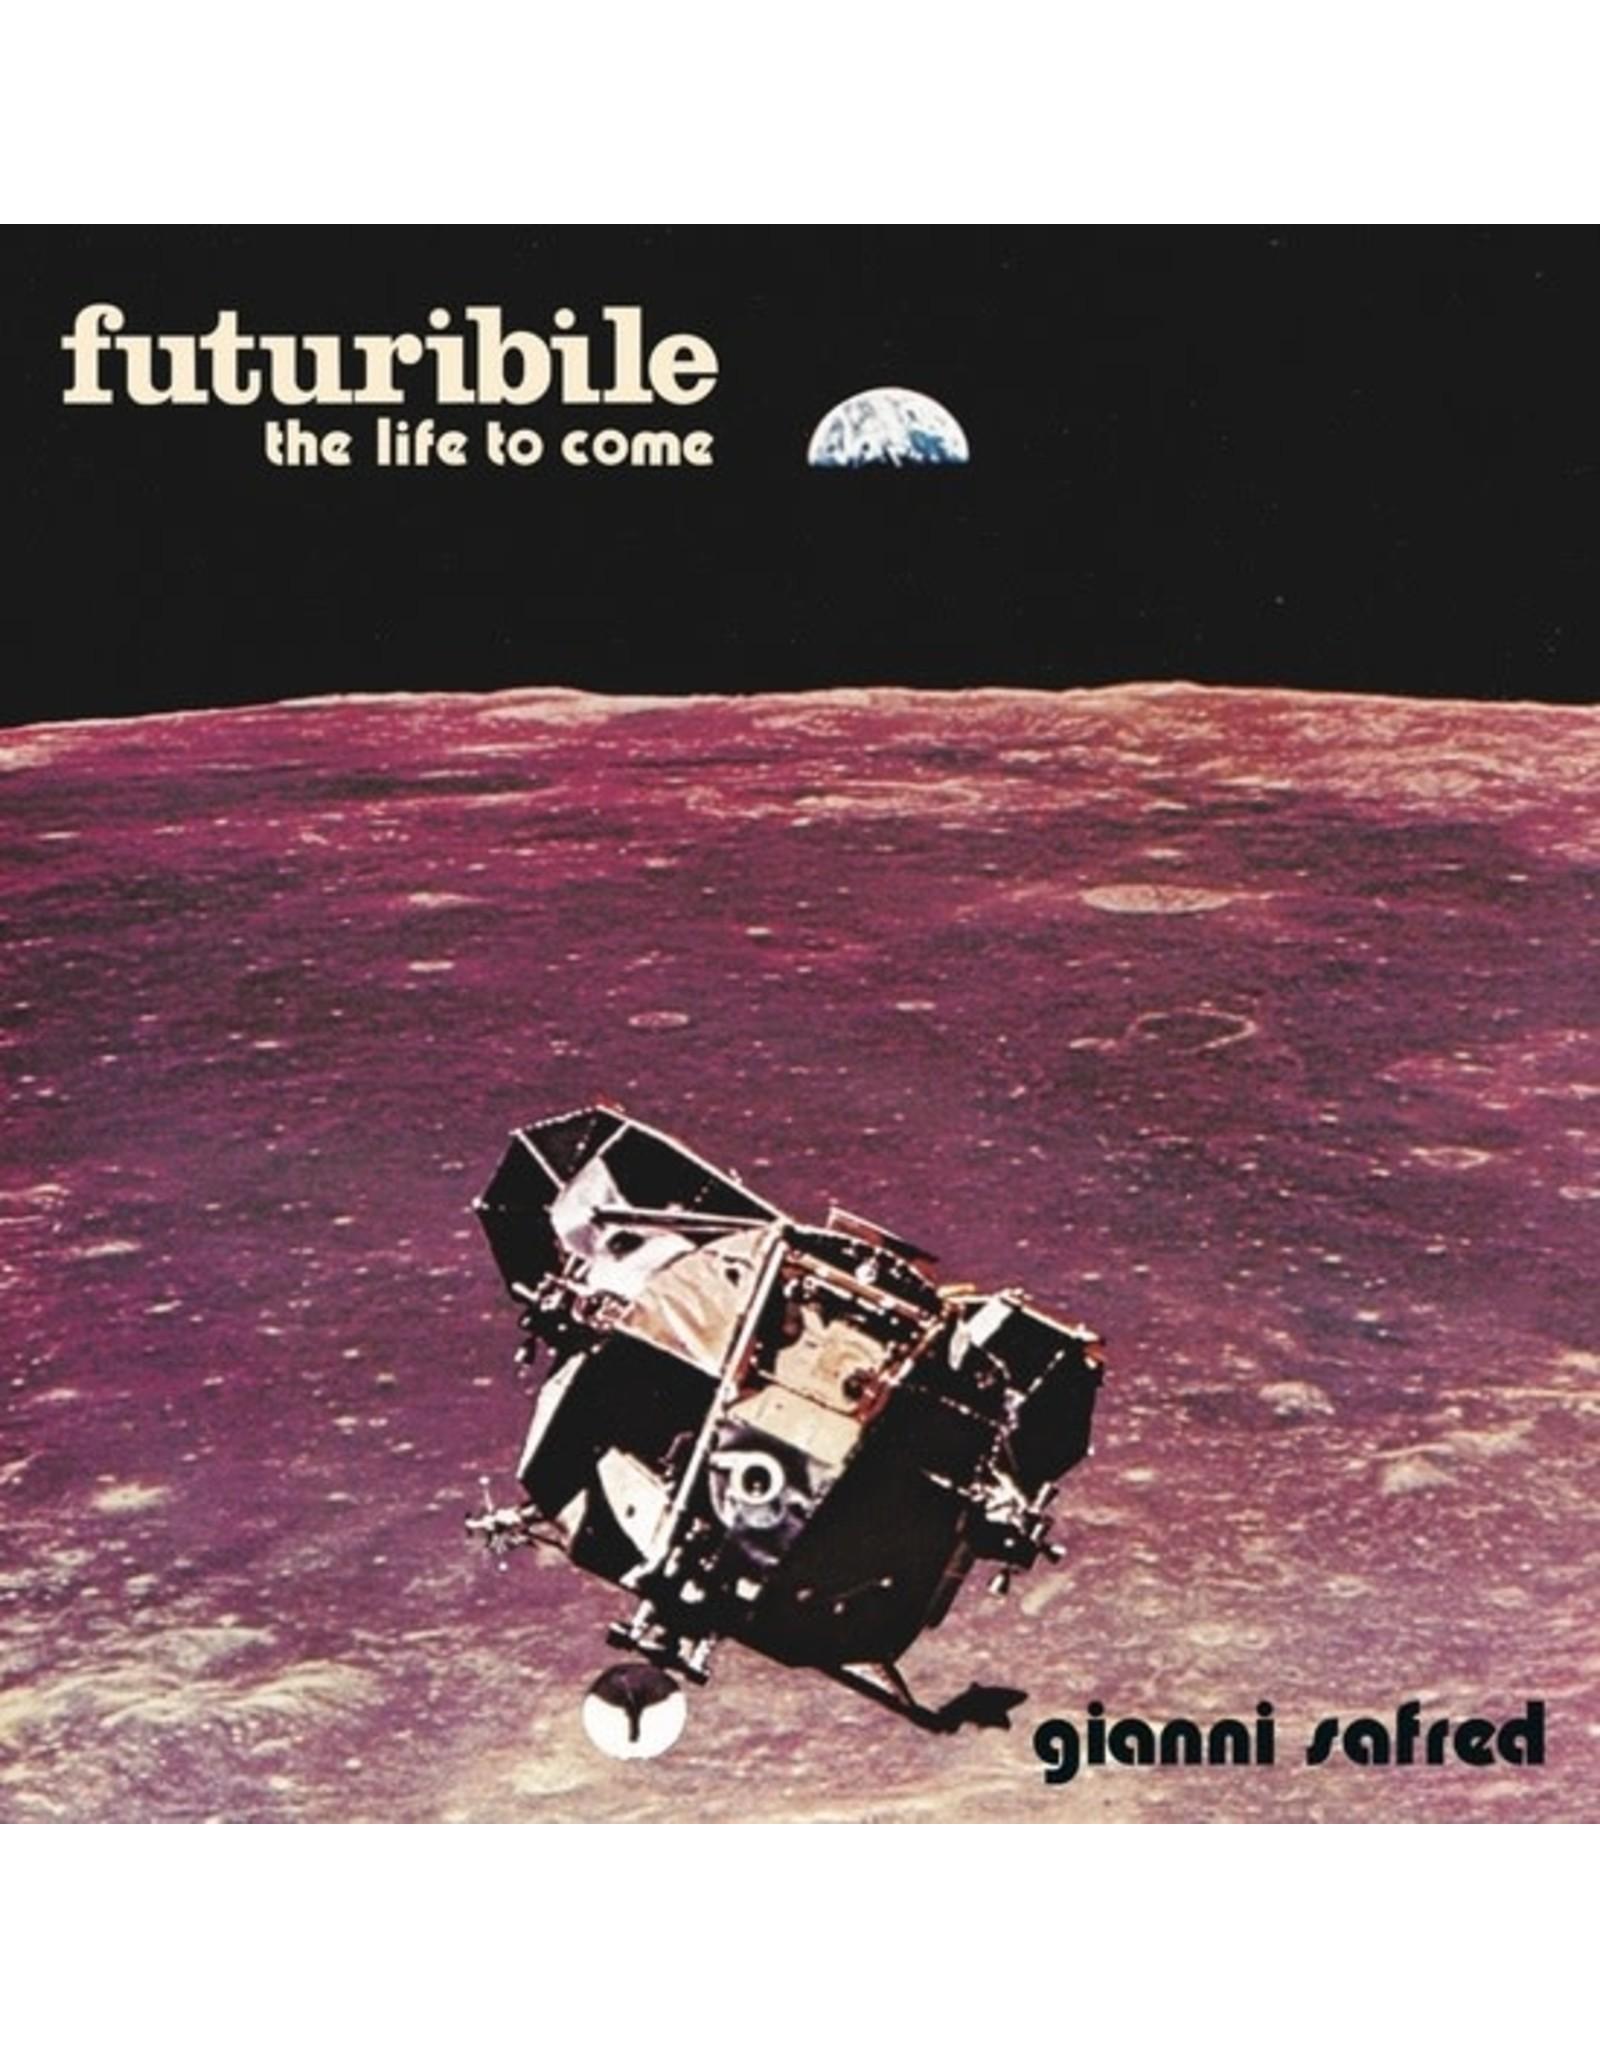 Four Flies Safred, Gianni: Futuribile - The Life to Come LP